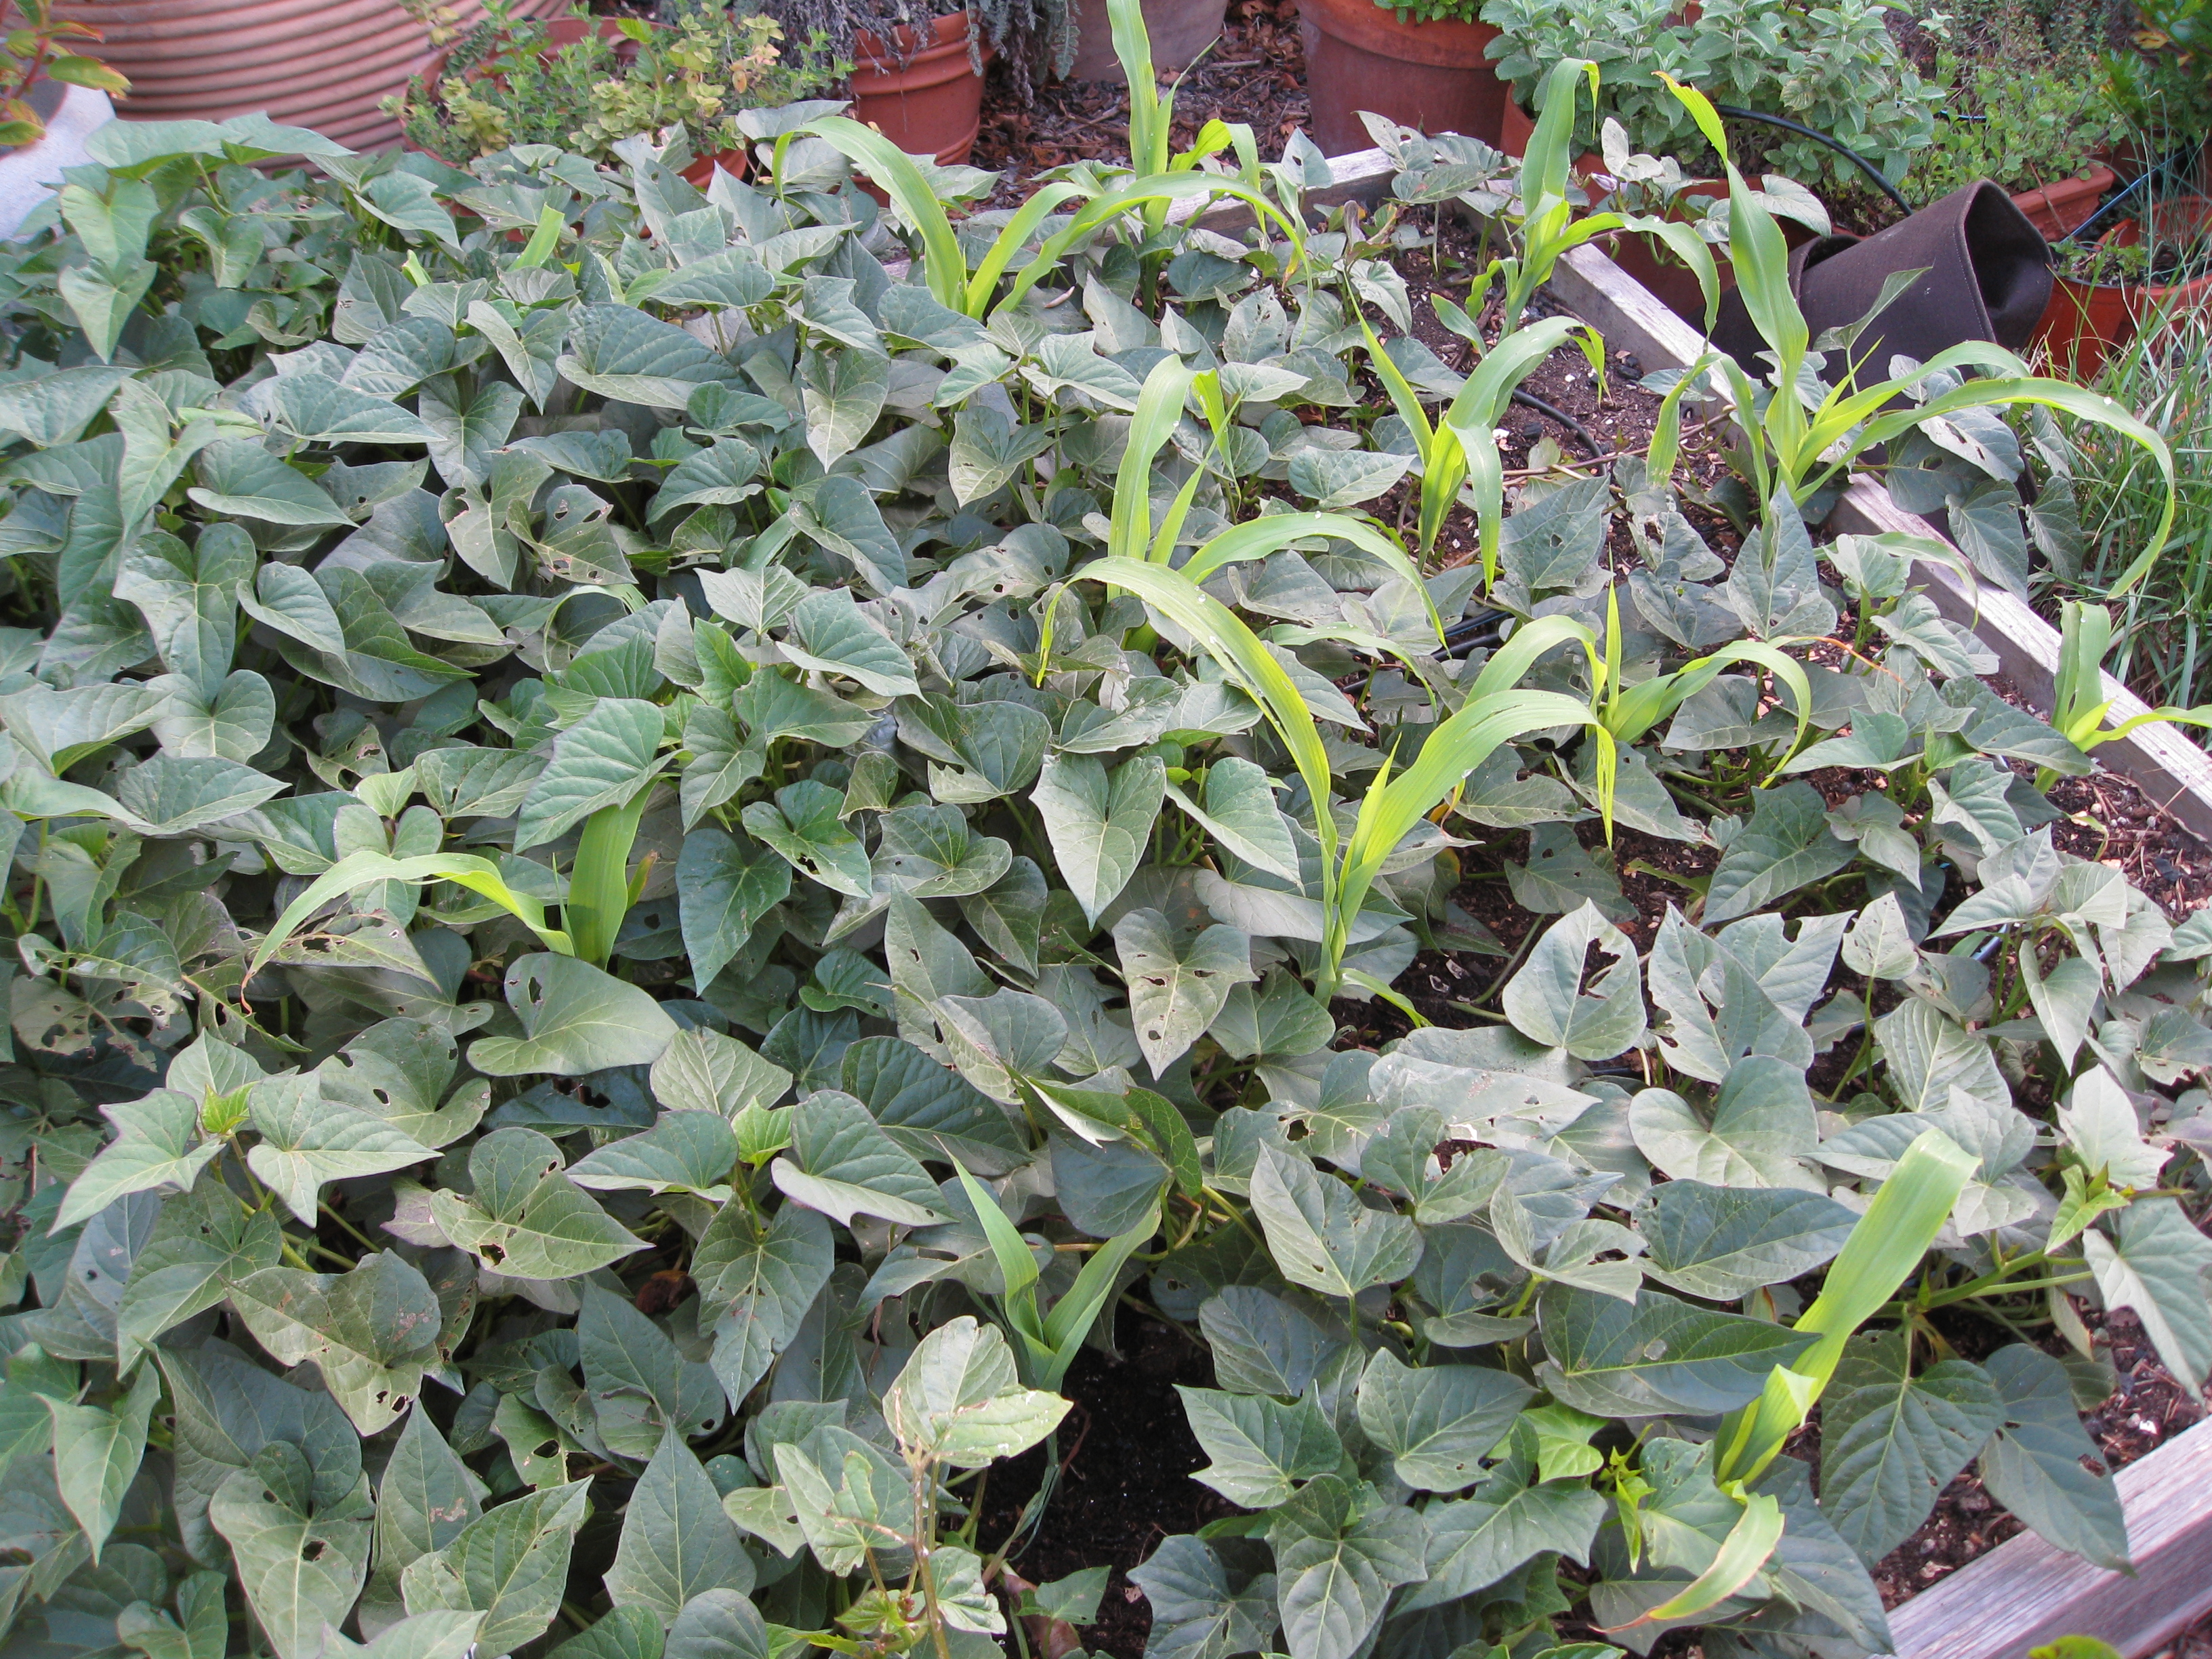 Corn interplanted with sweet potatoes.